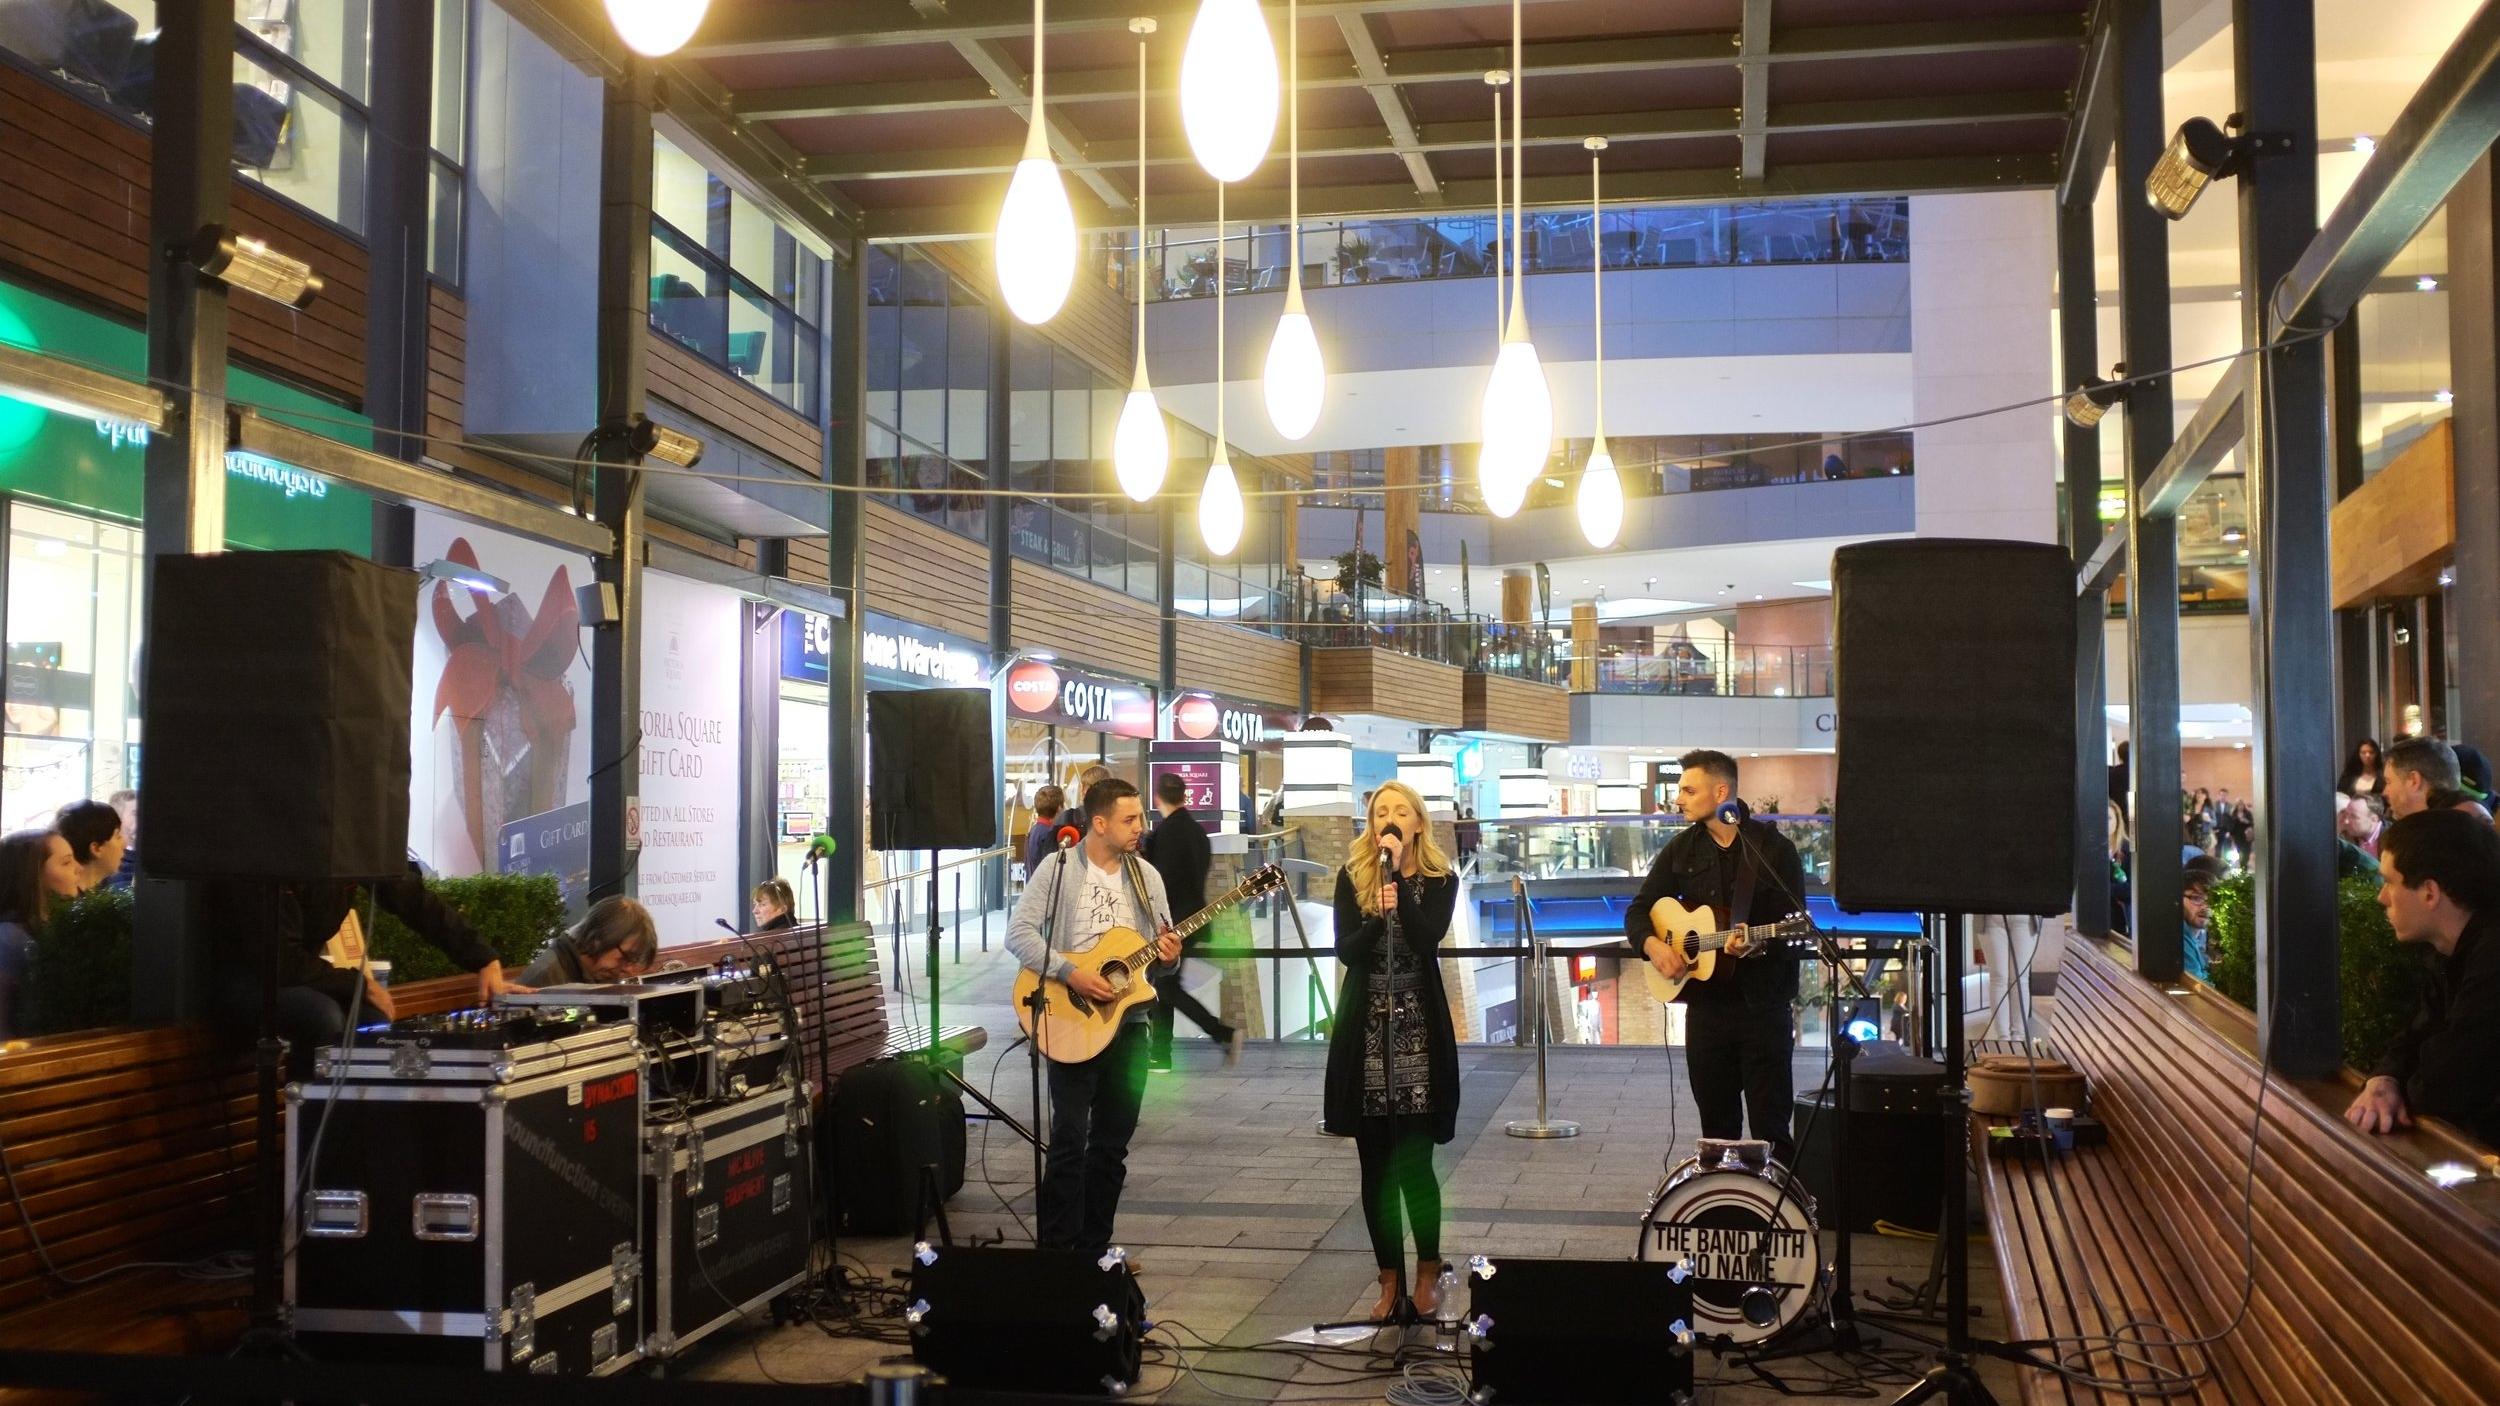 Belfast Culture Night- Victoria Square Pergola